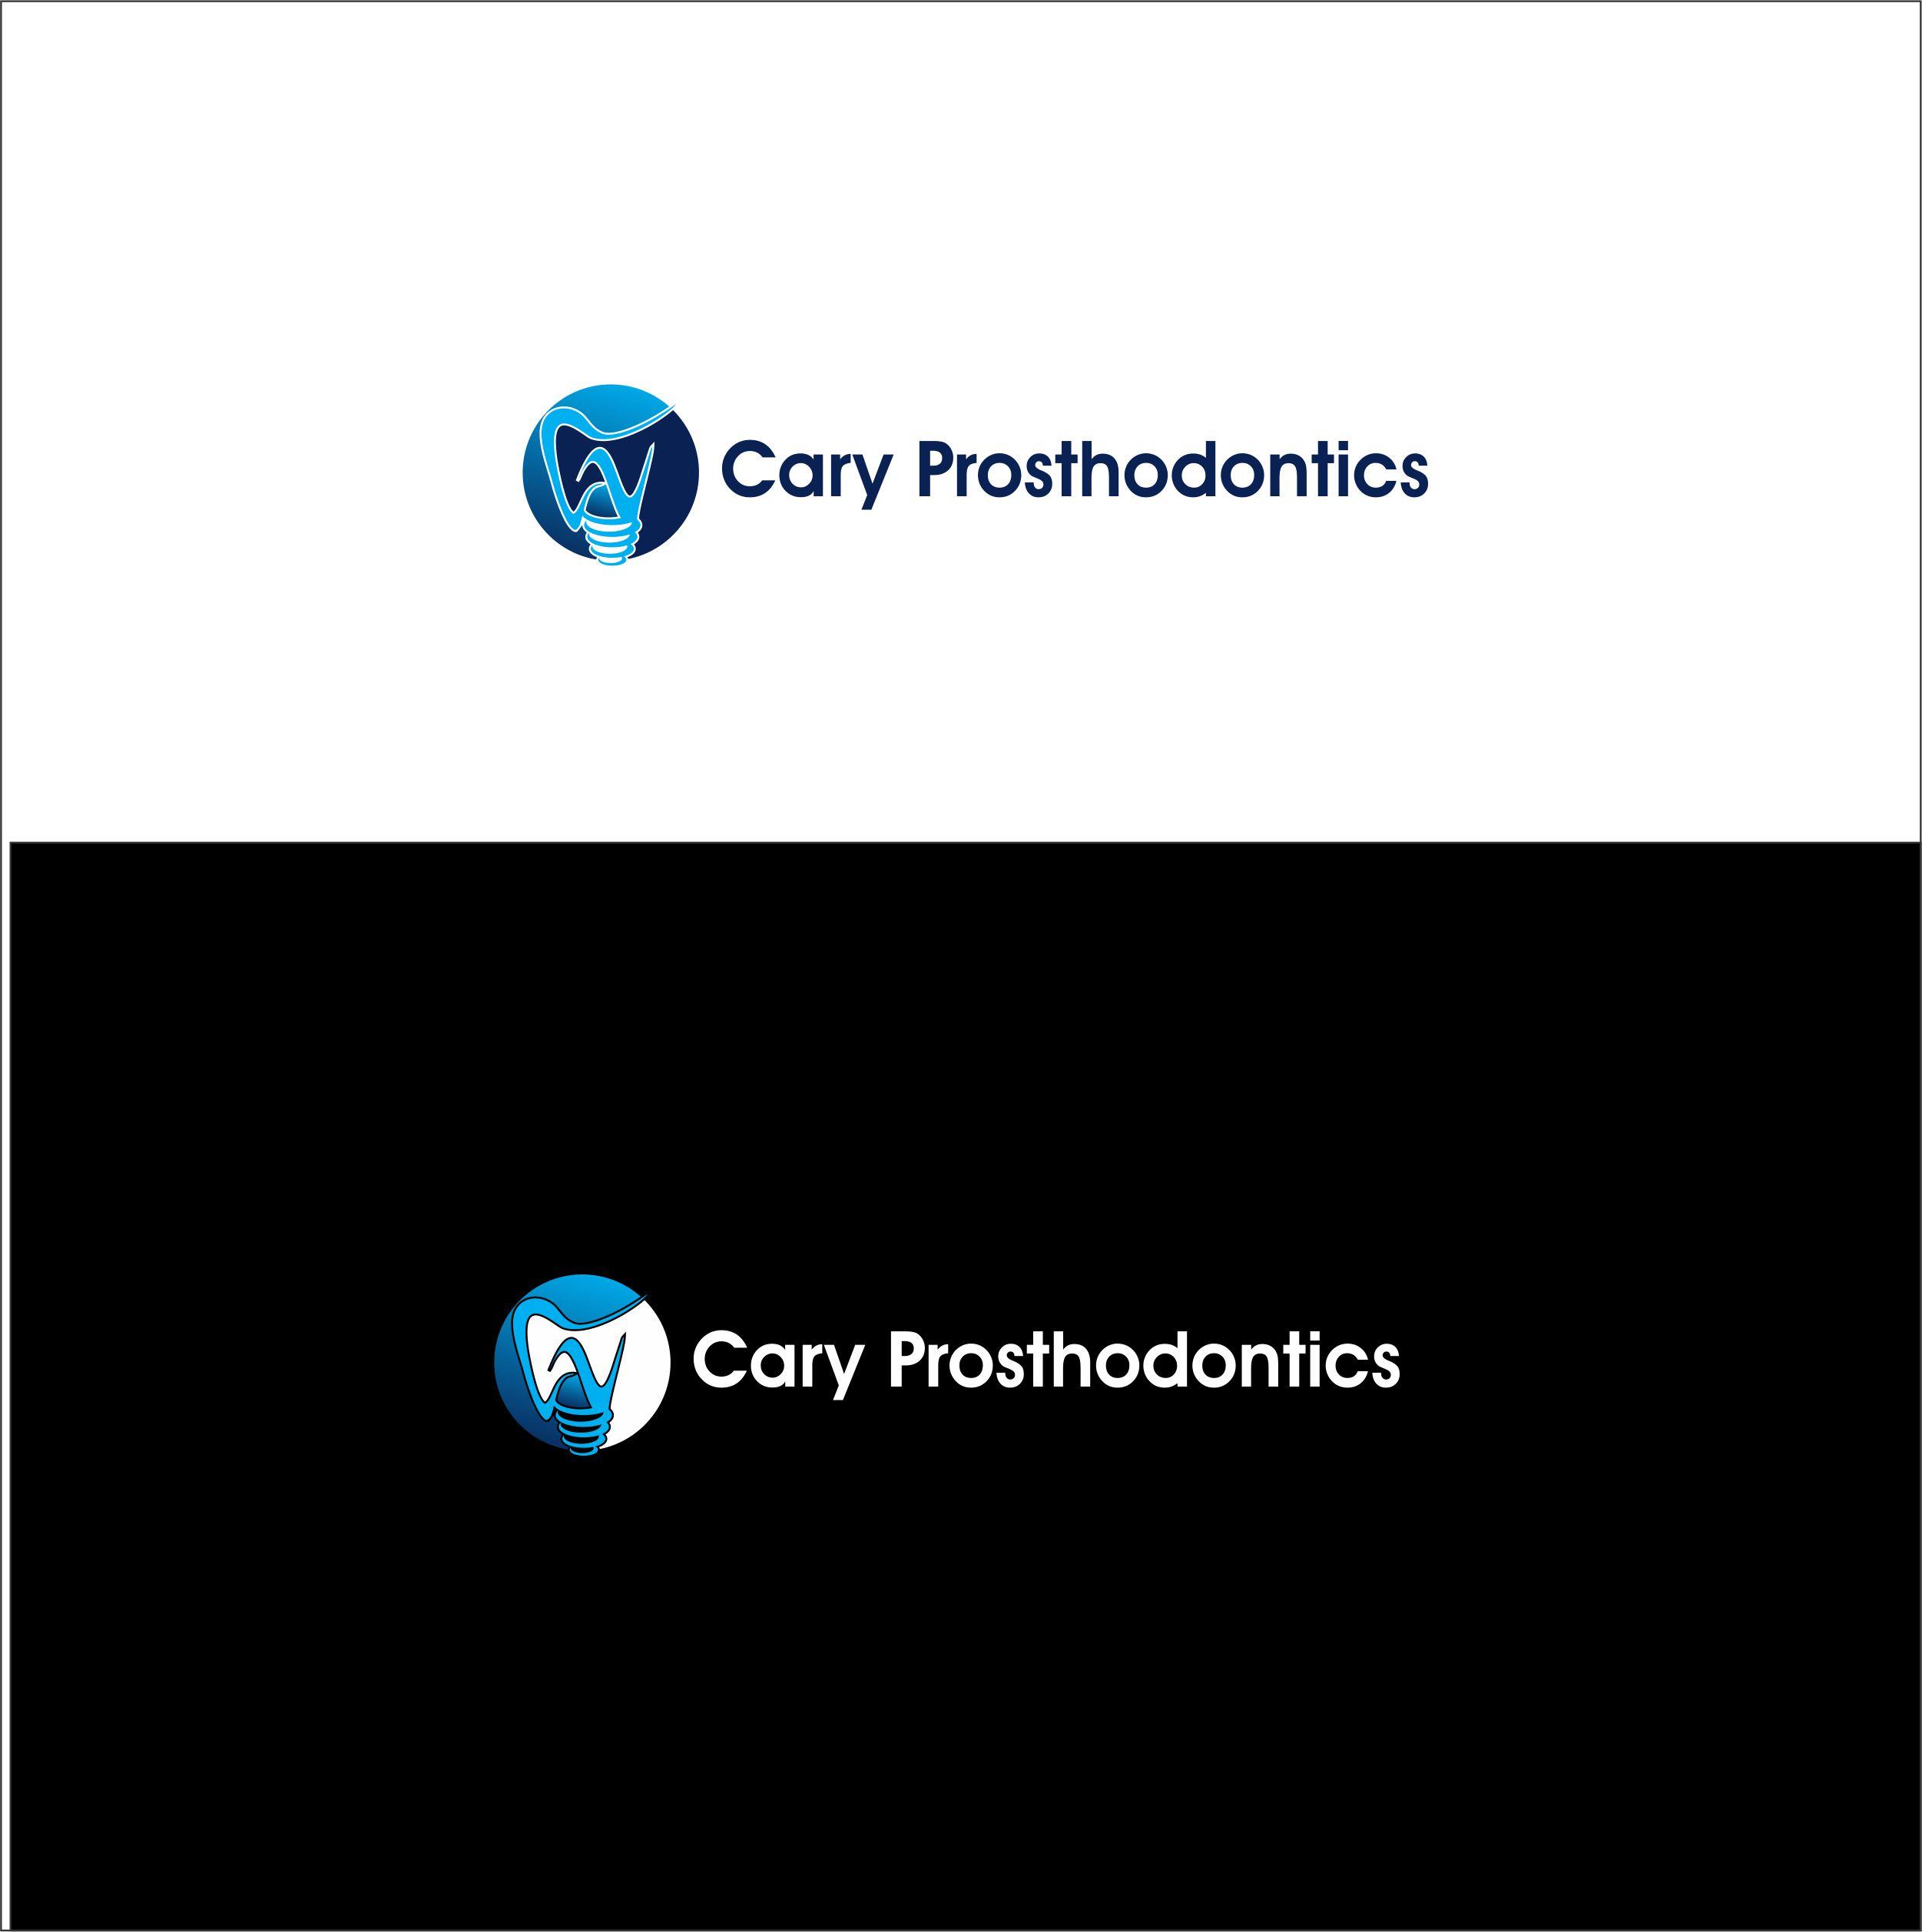 Logo Design by ian69 - Entry No. 66 in the Logo Design Contest Cary Prosthodontics Logo Design.